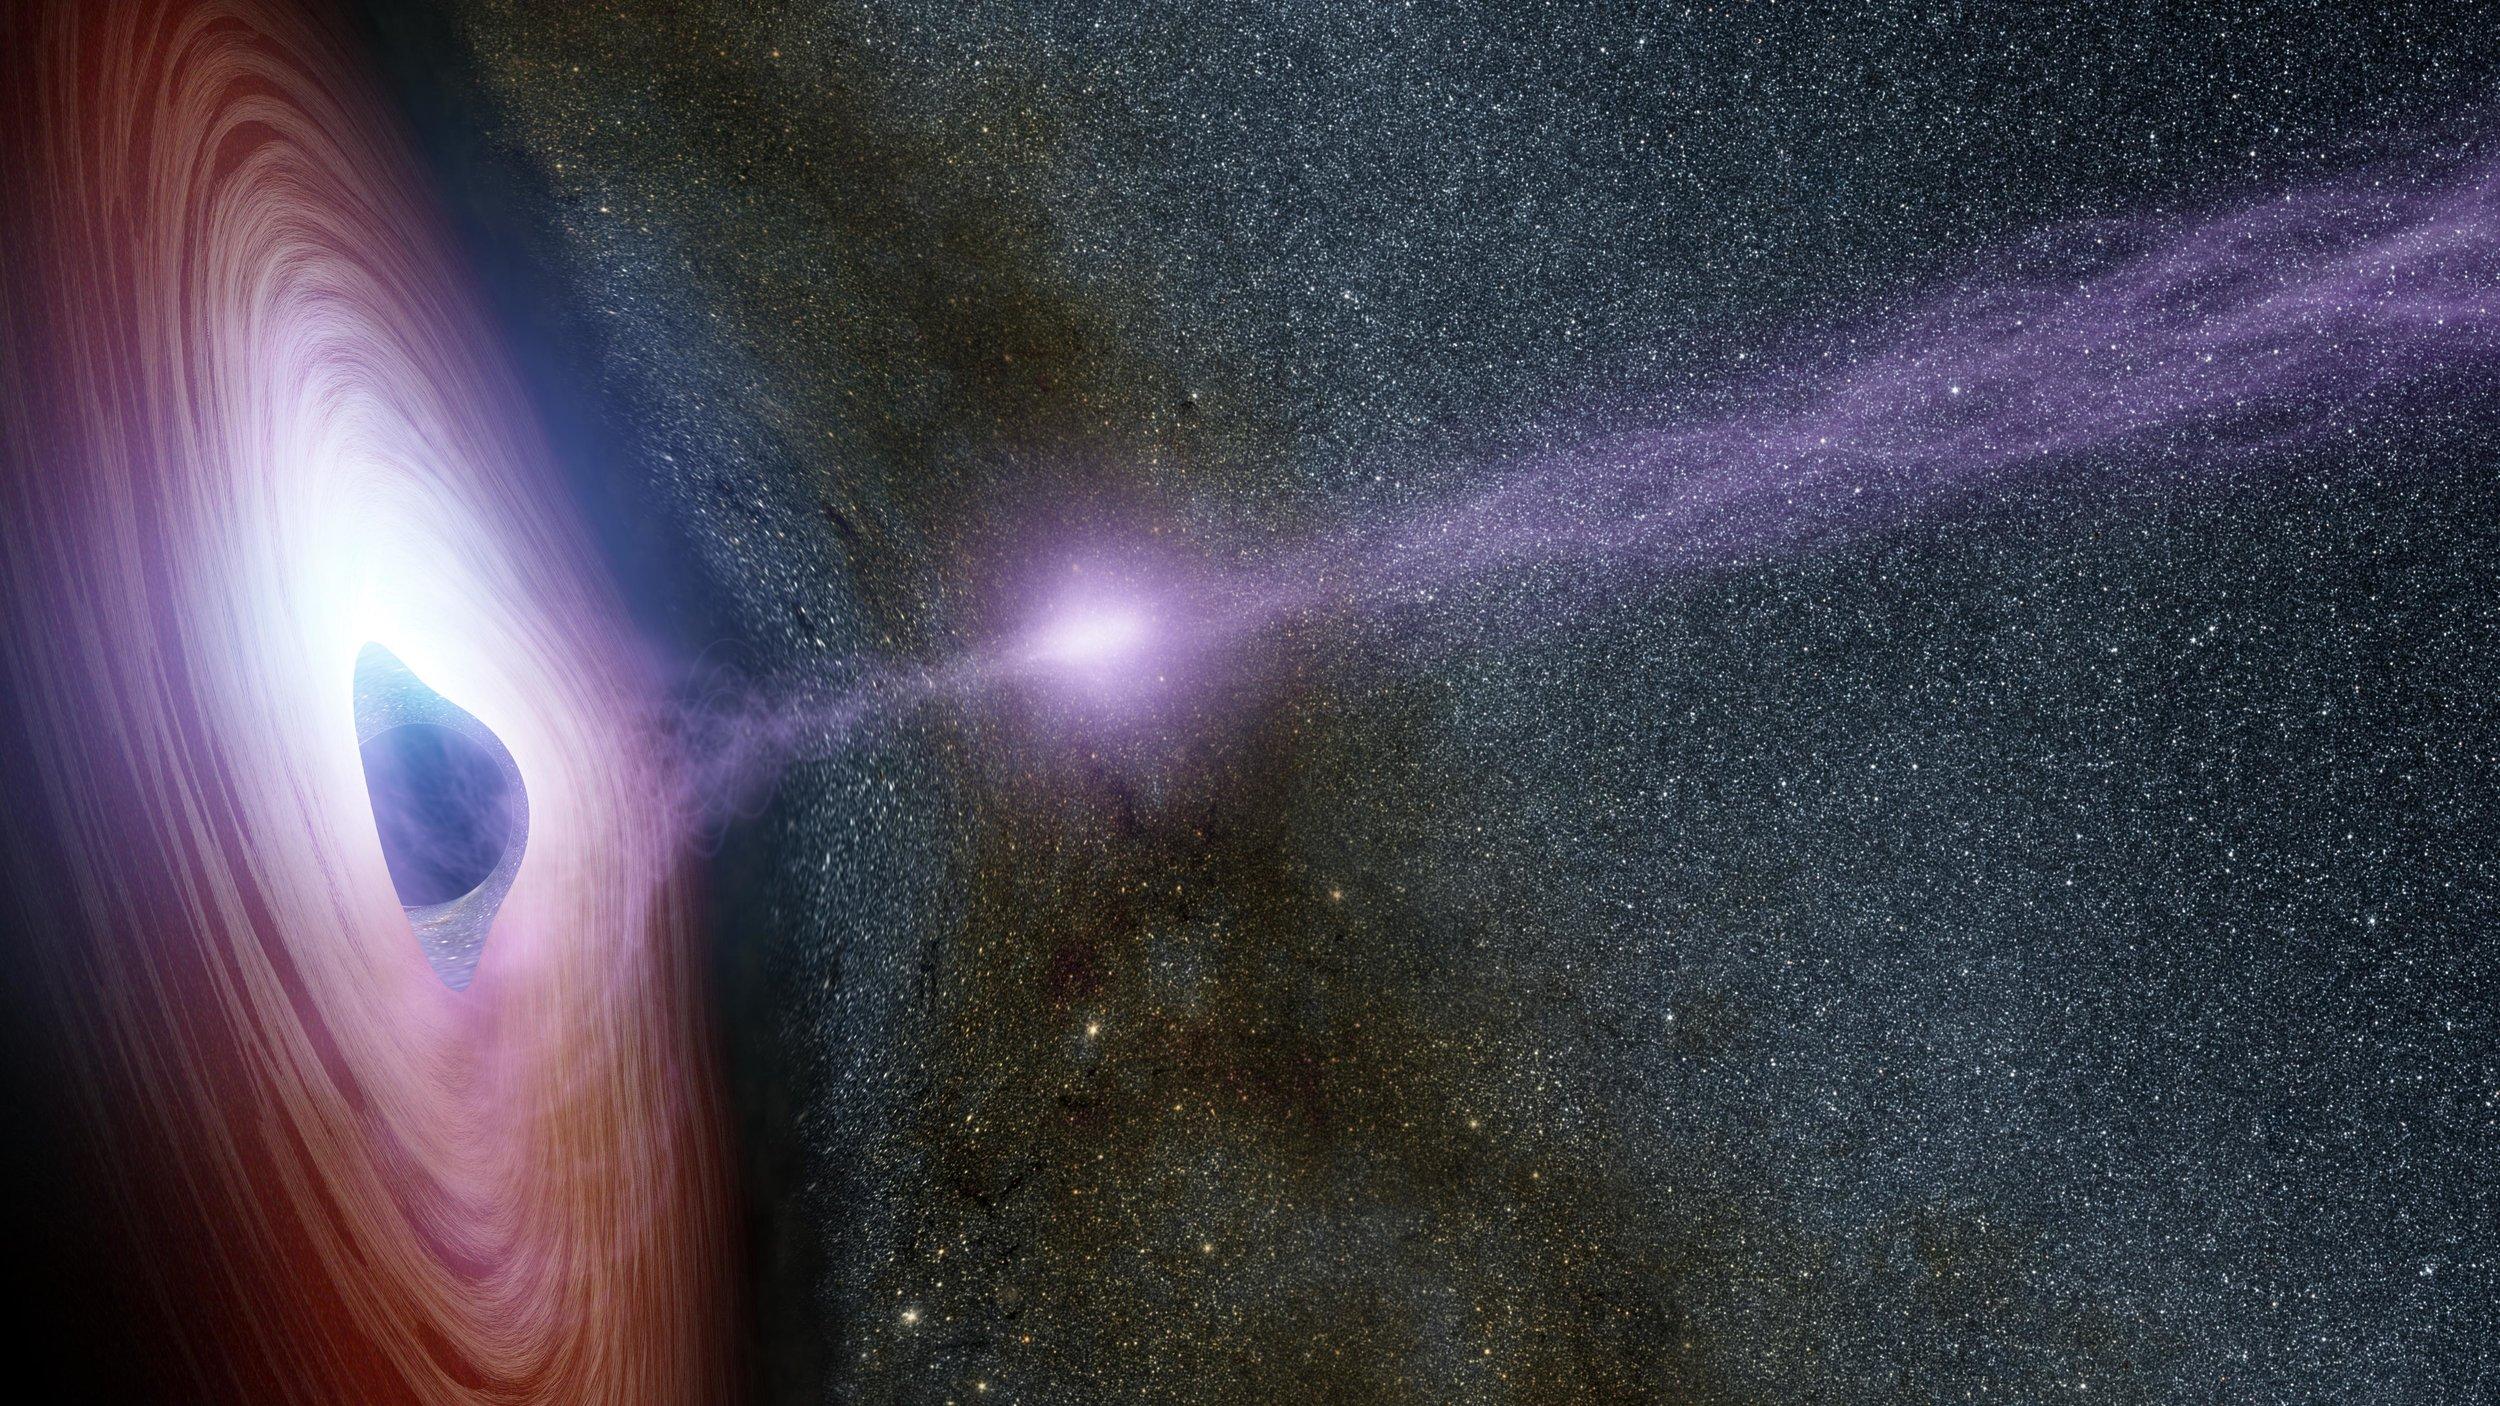 (Image Credit: IPAC-Caltech)